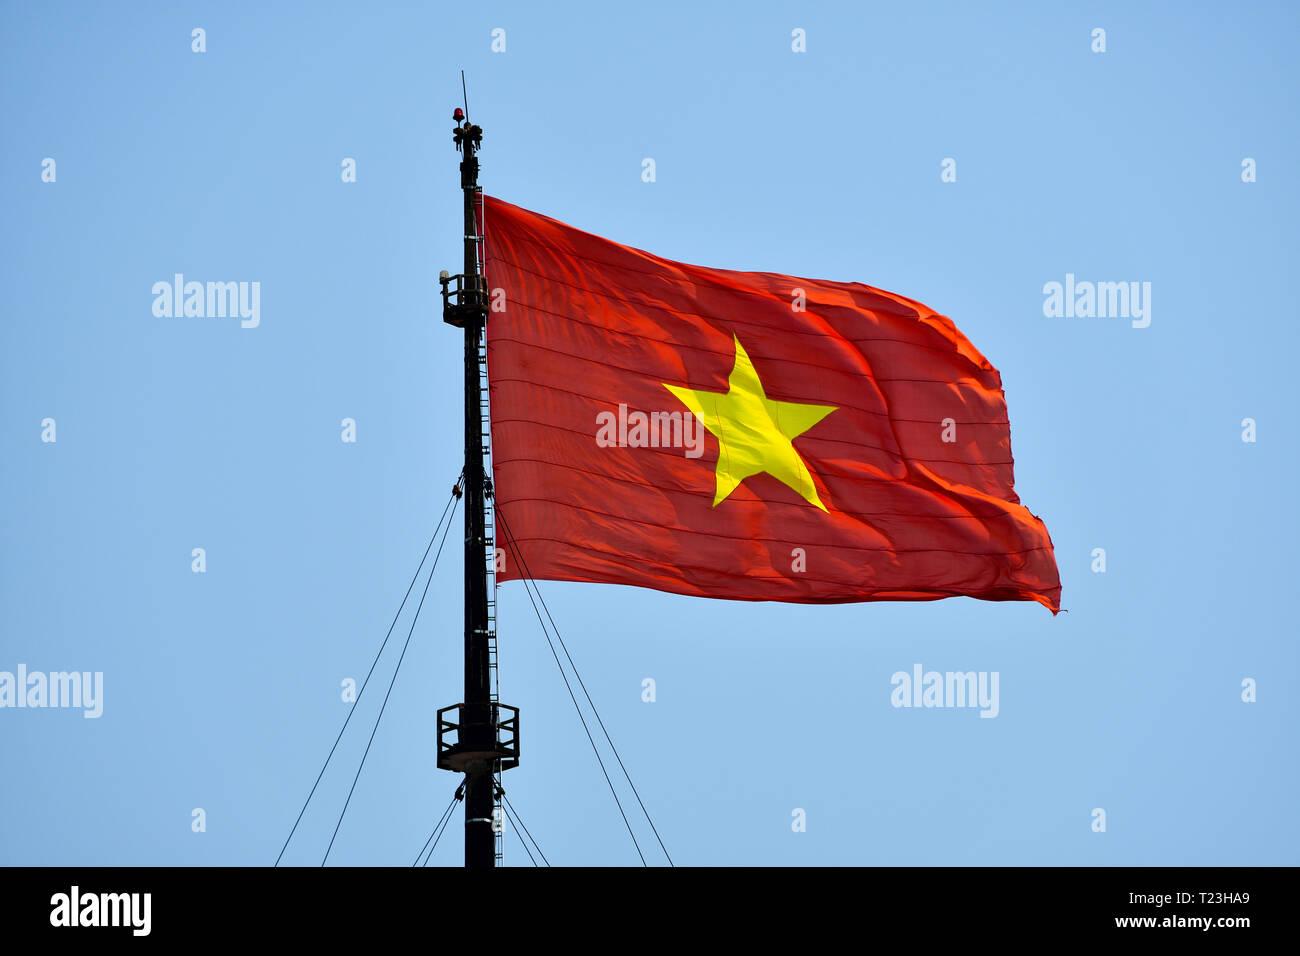 Gelben mit fahne stern rot Flagge Rot,